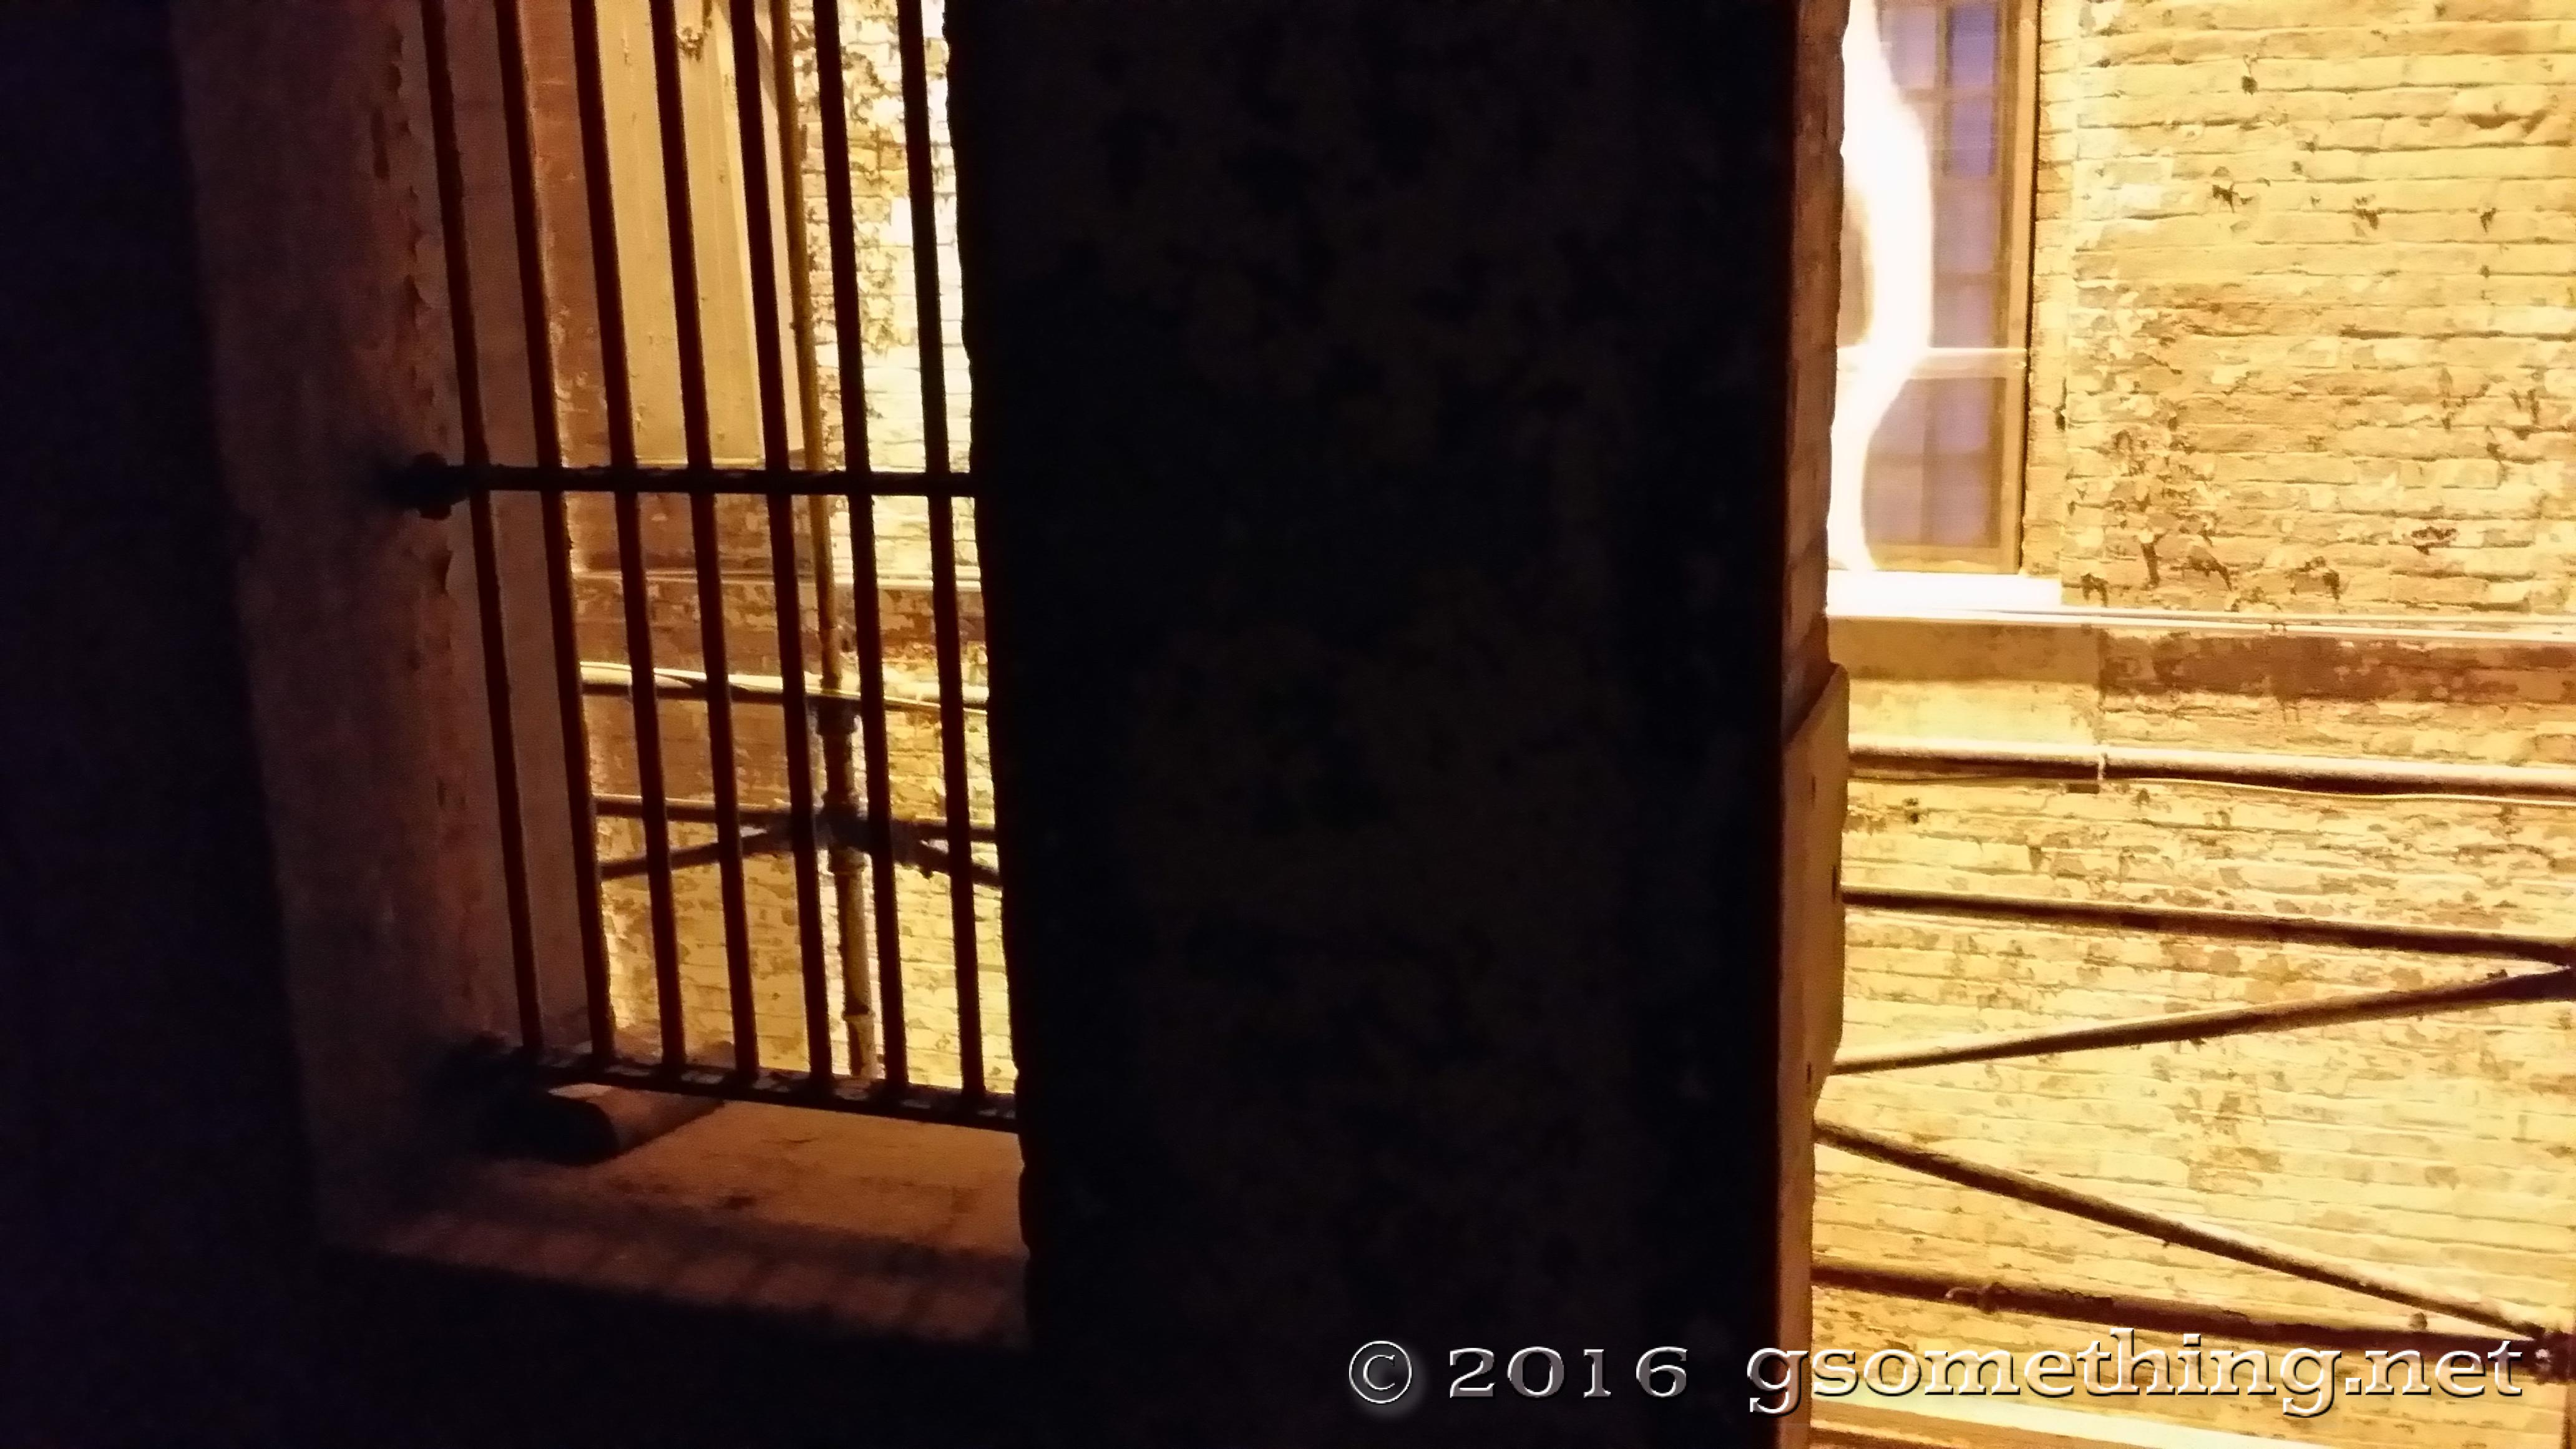 mansfield_reformatory_2nd_trip_71.jpg